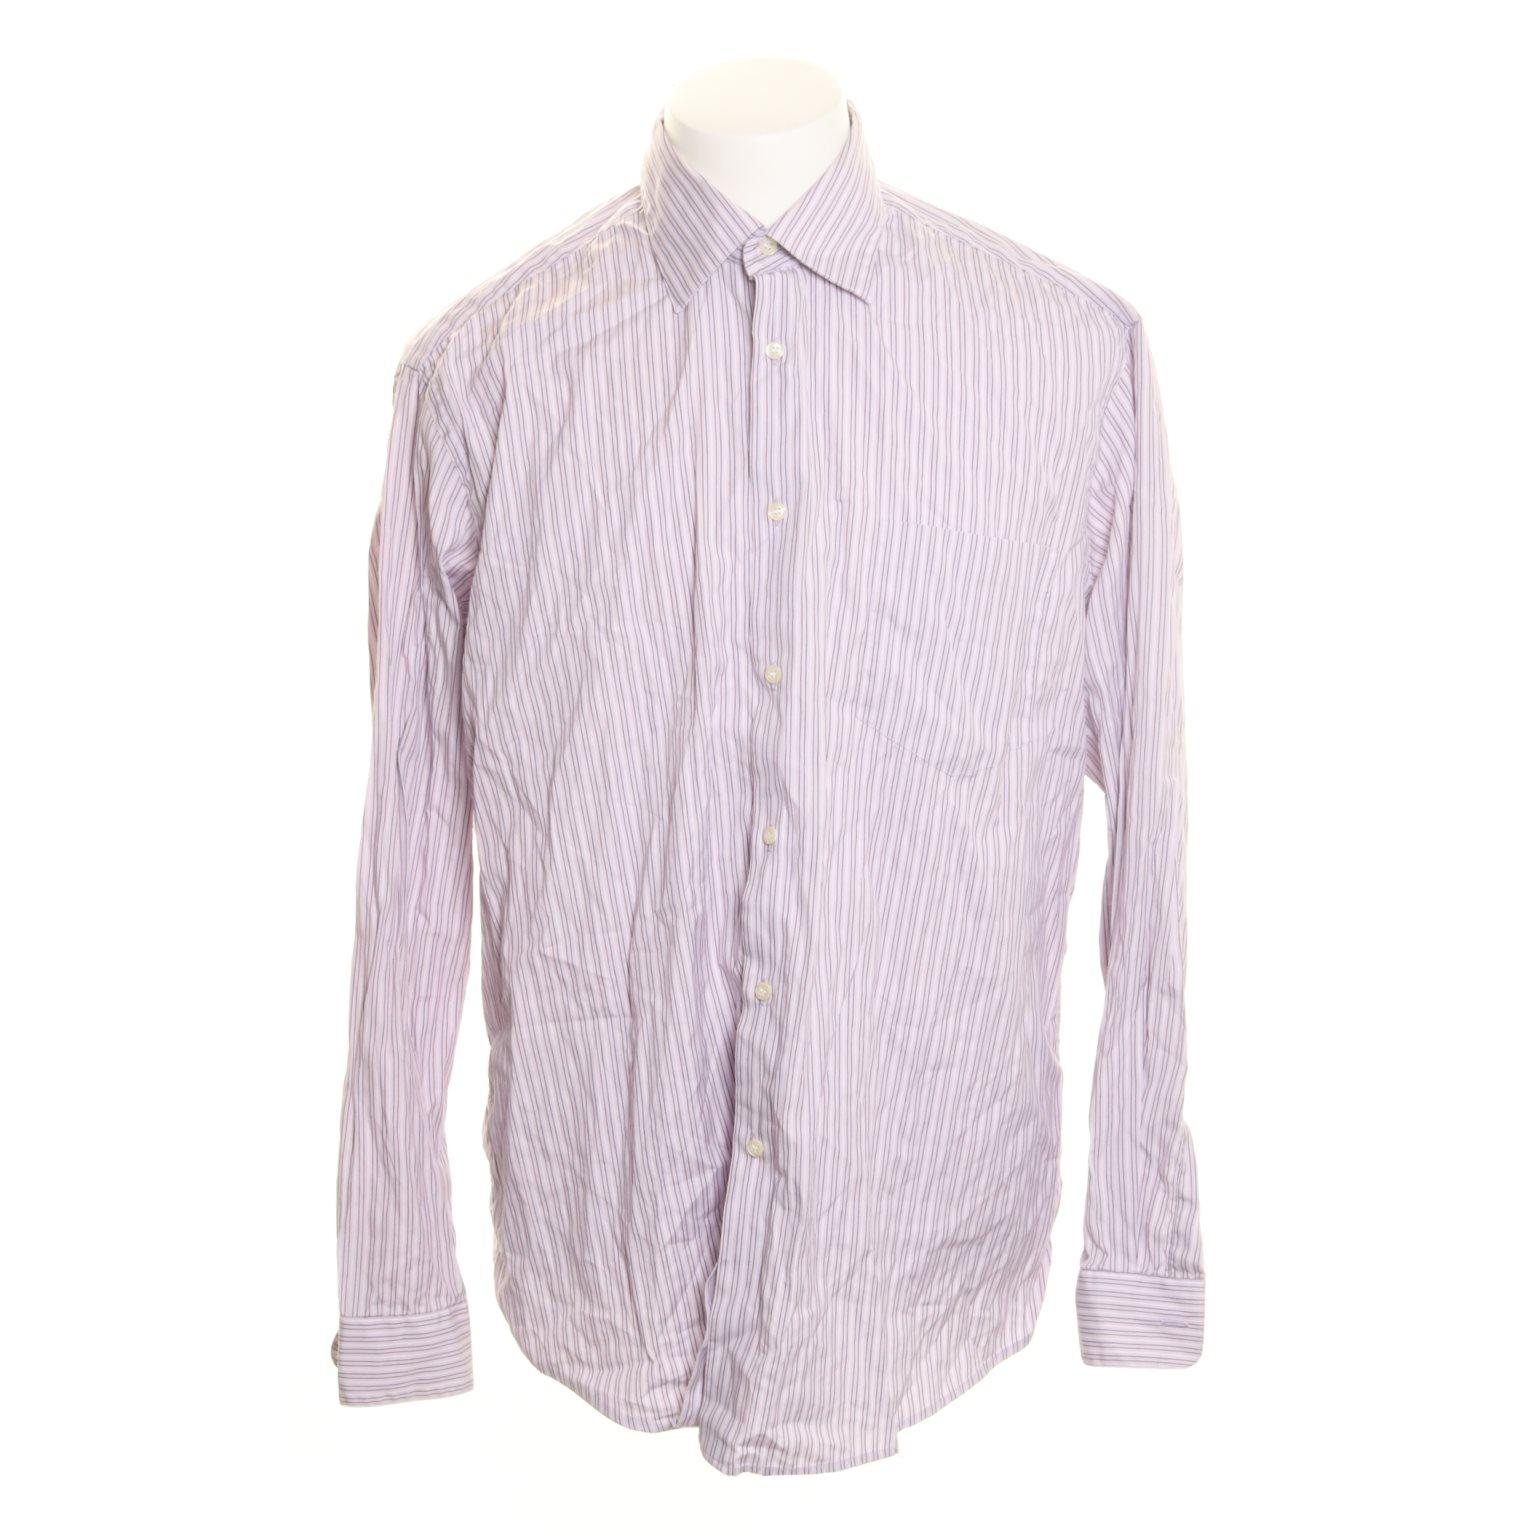 Hugo Boss, Skjorta, Strl: 41, Lavendelfärgad/Vit